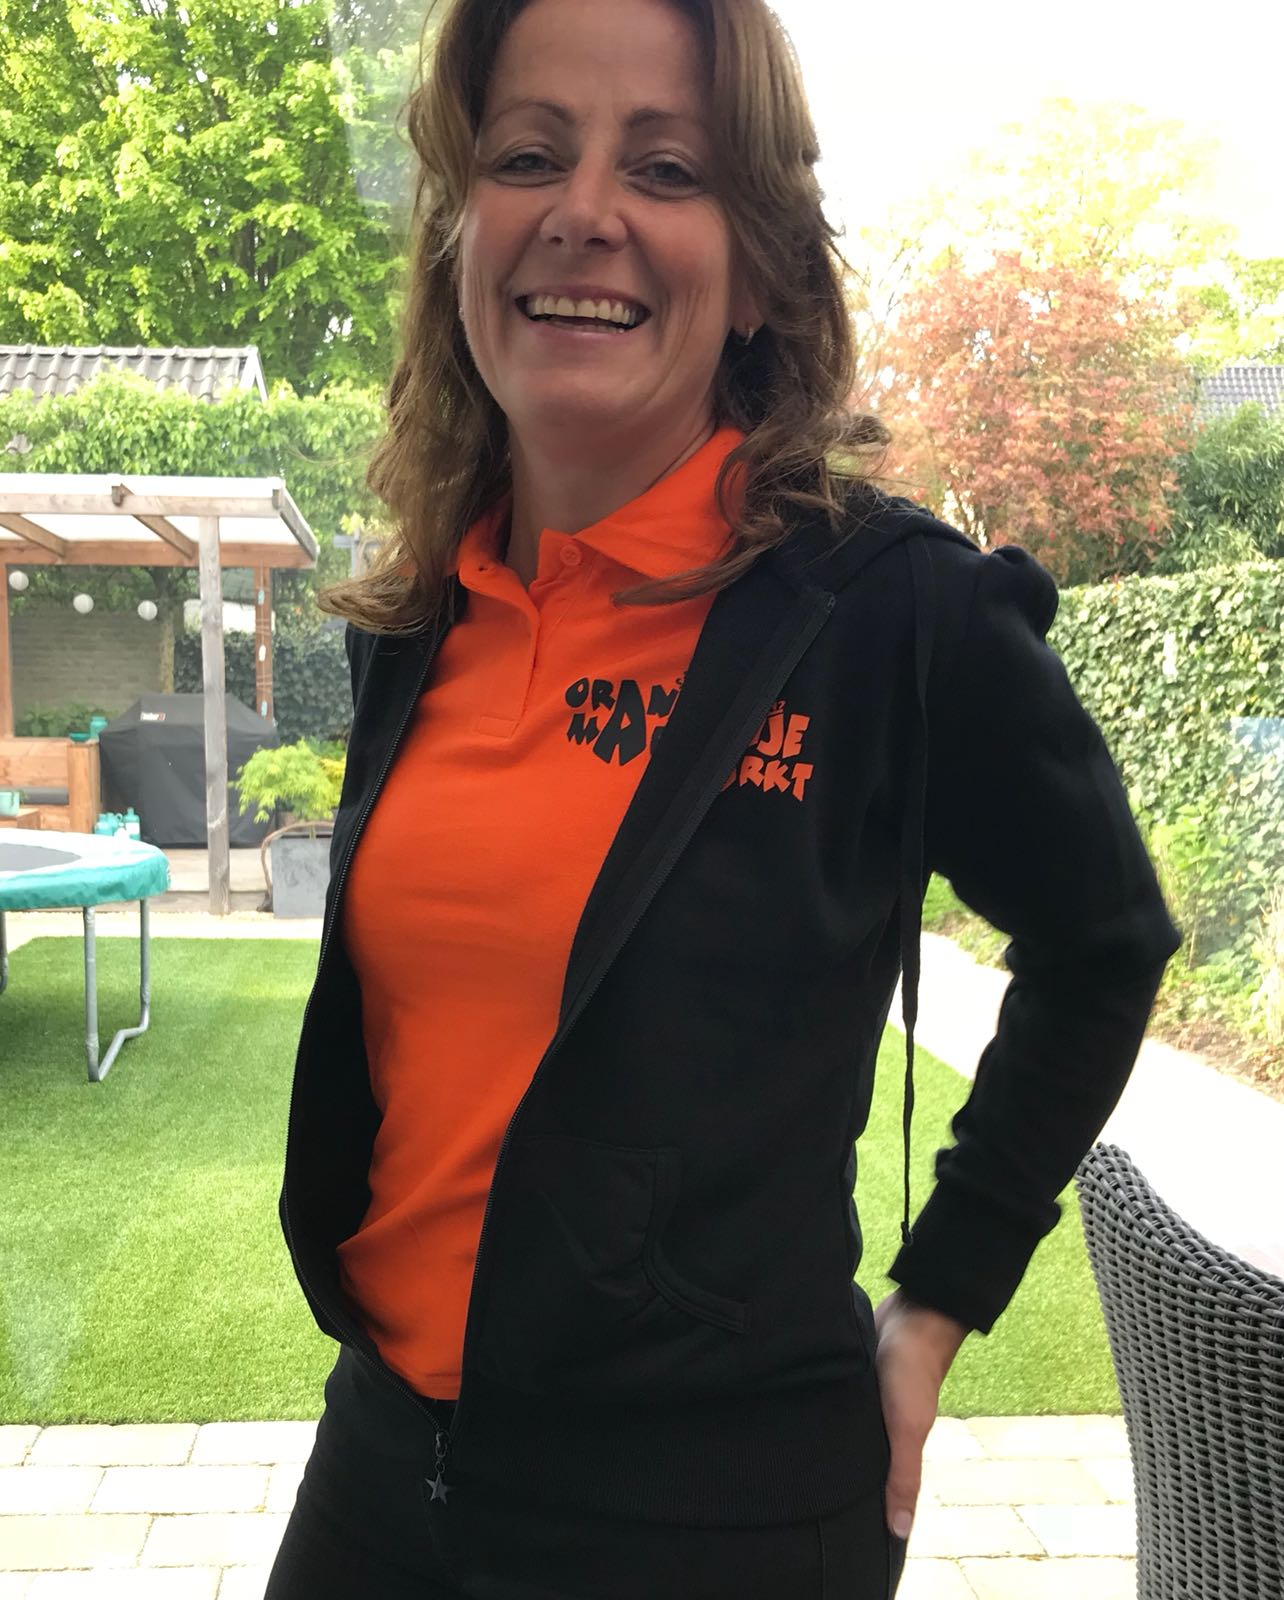 kristel Gijsbers-Voets_Voorzitter Oranjemarkt Veldhoven